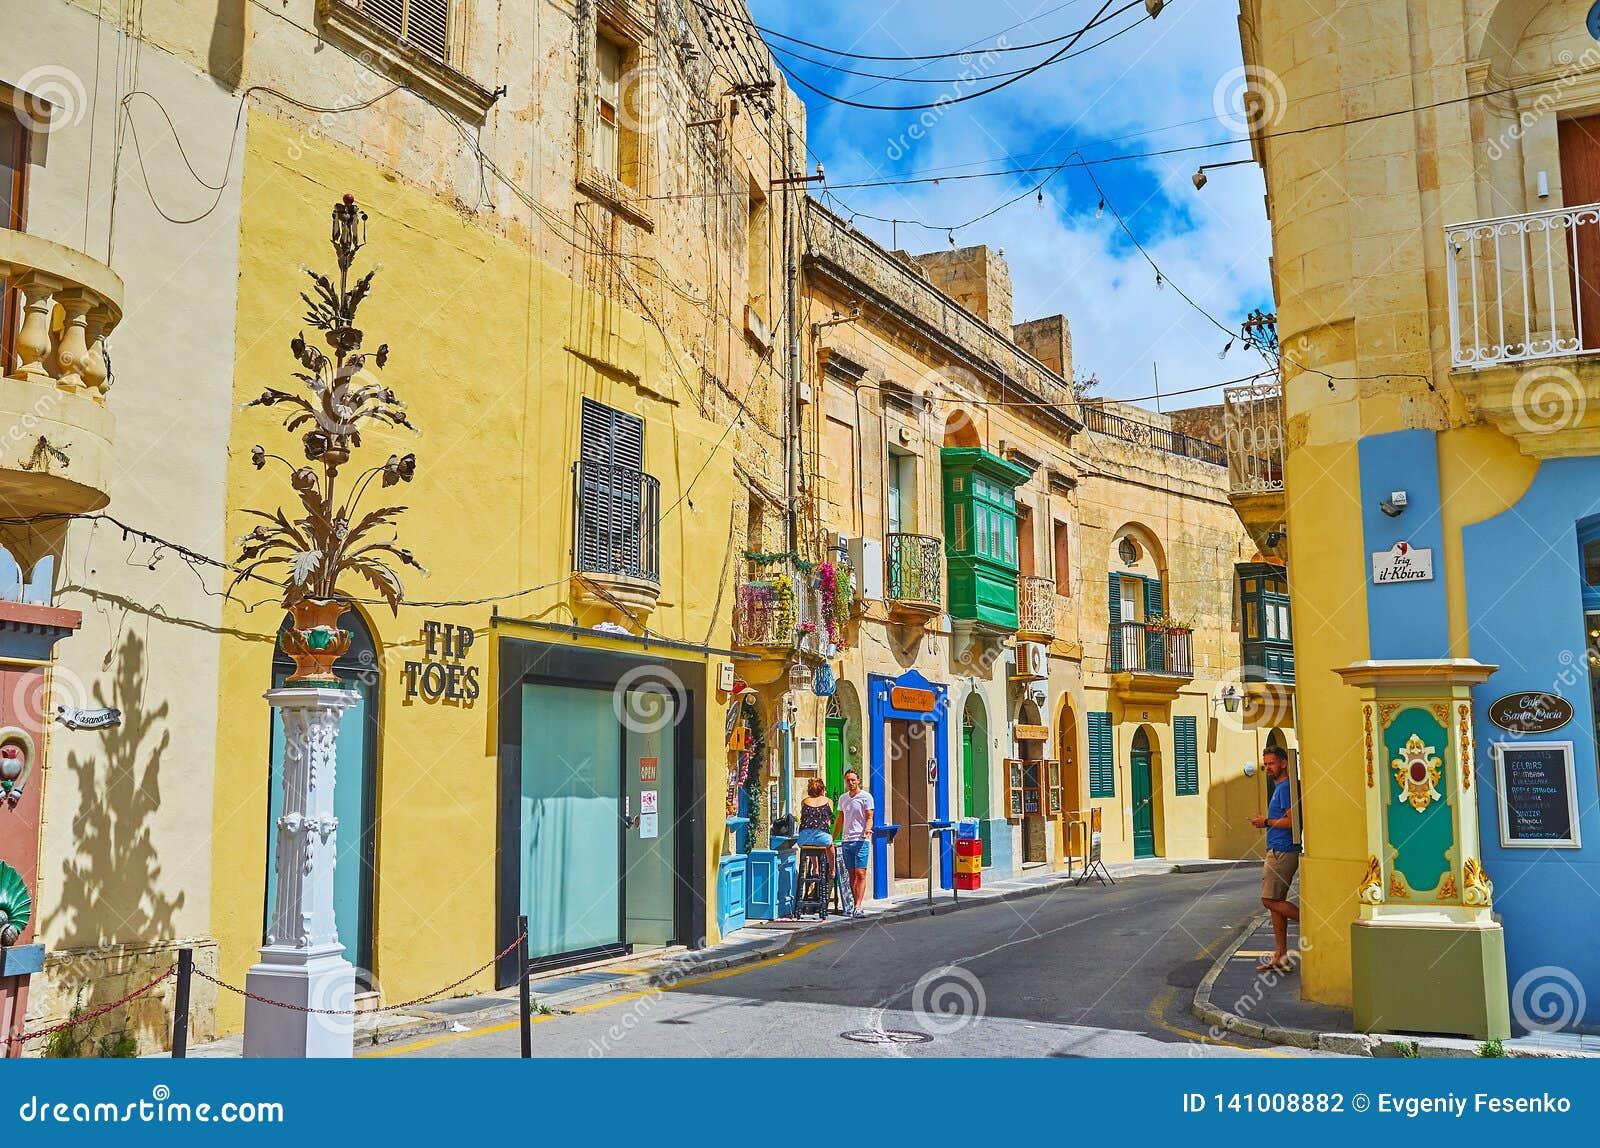 old town rabat malta rabat malta june tourist street old town many souvenir shops small cafes bars historical 141008882